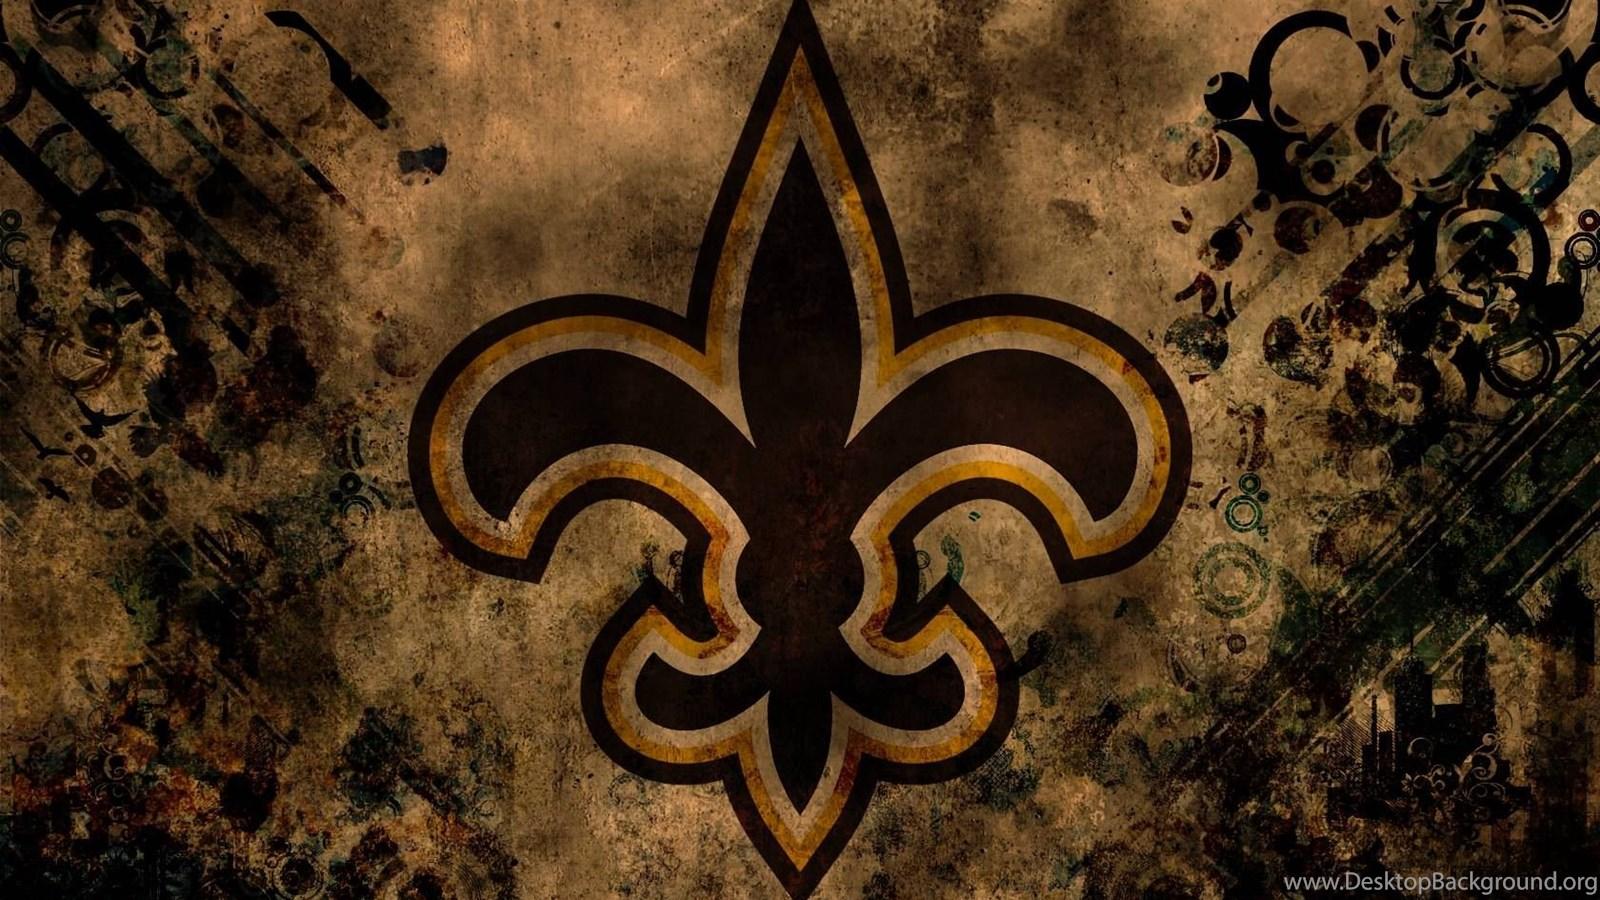 New Orleans Saints Wallpapers Hd Free Download Desktop ...